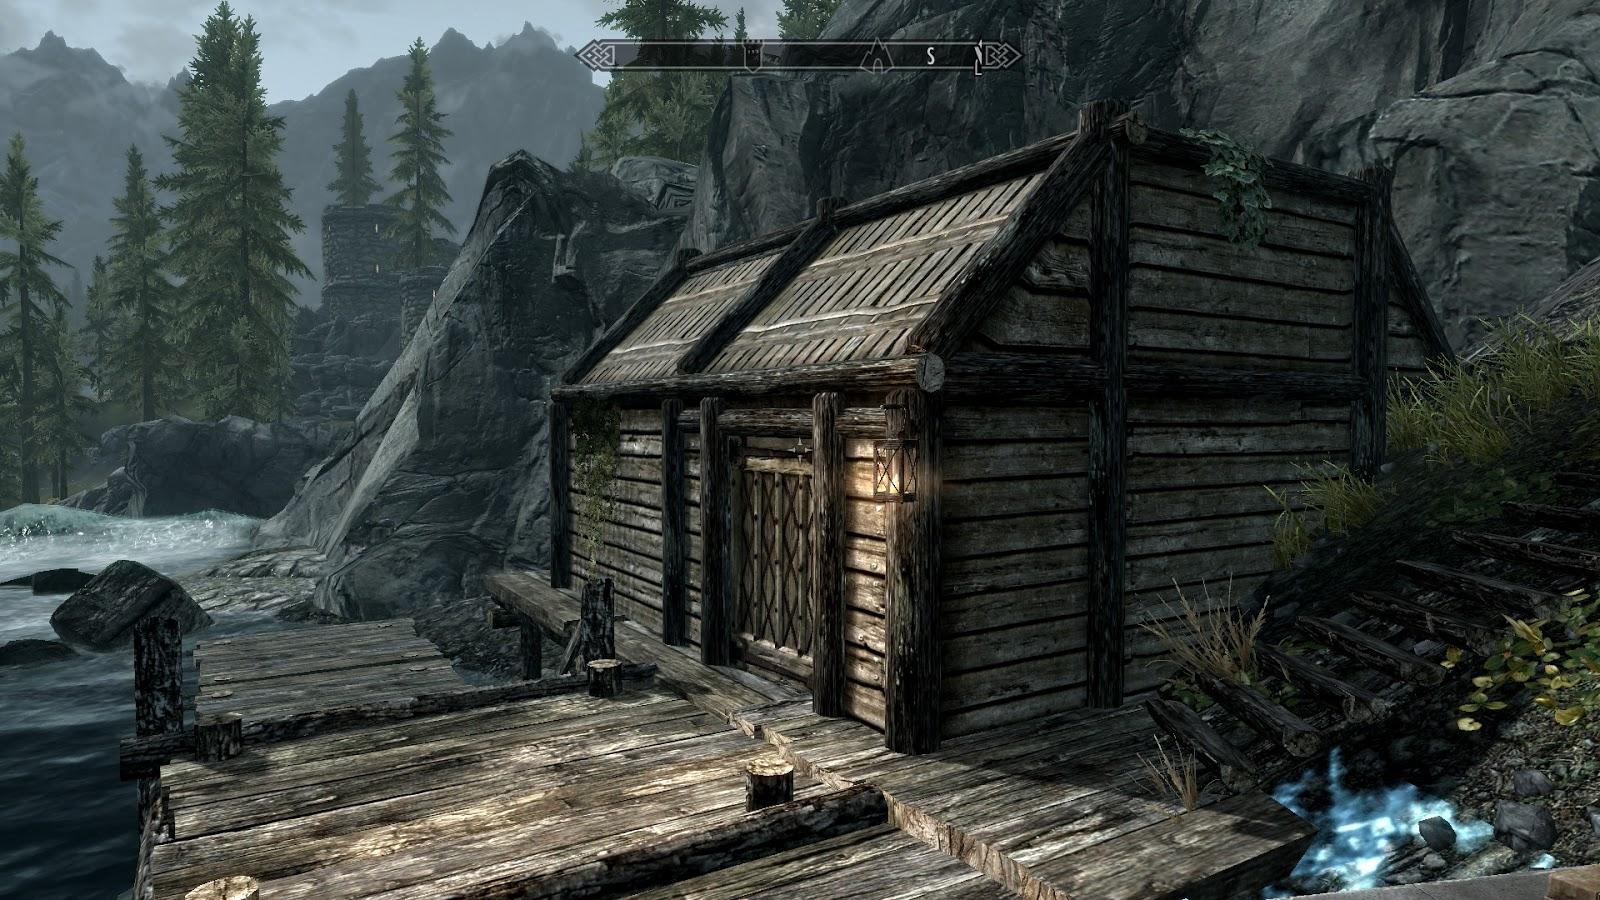 Skyrim Build Your Own Home Lucky